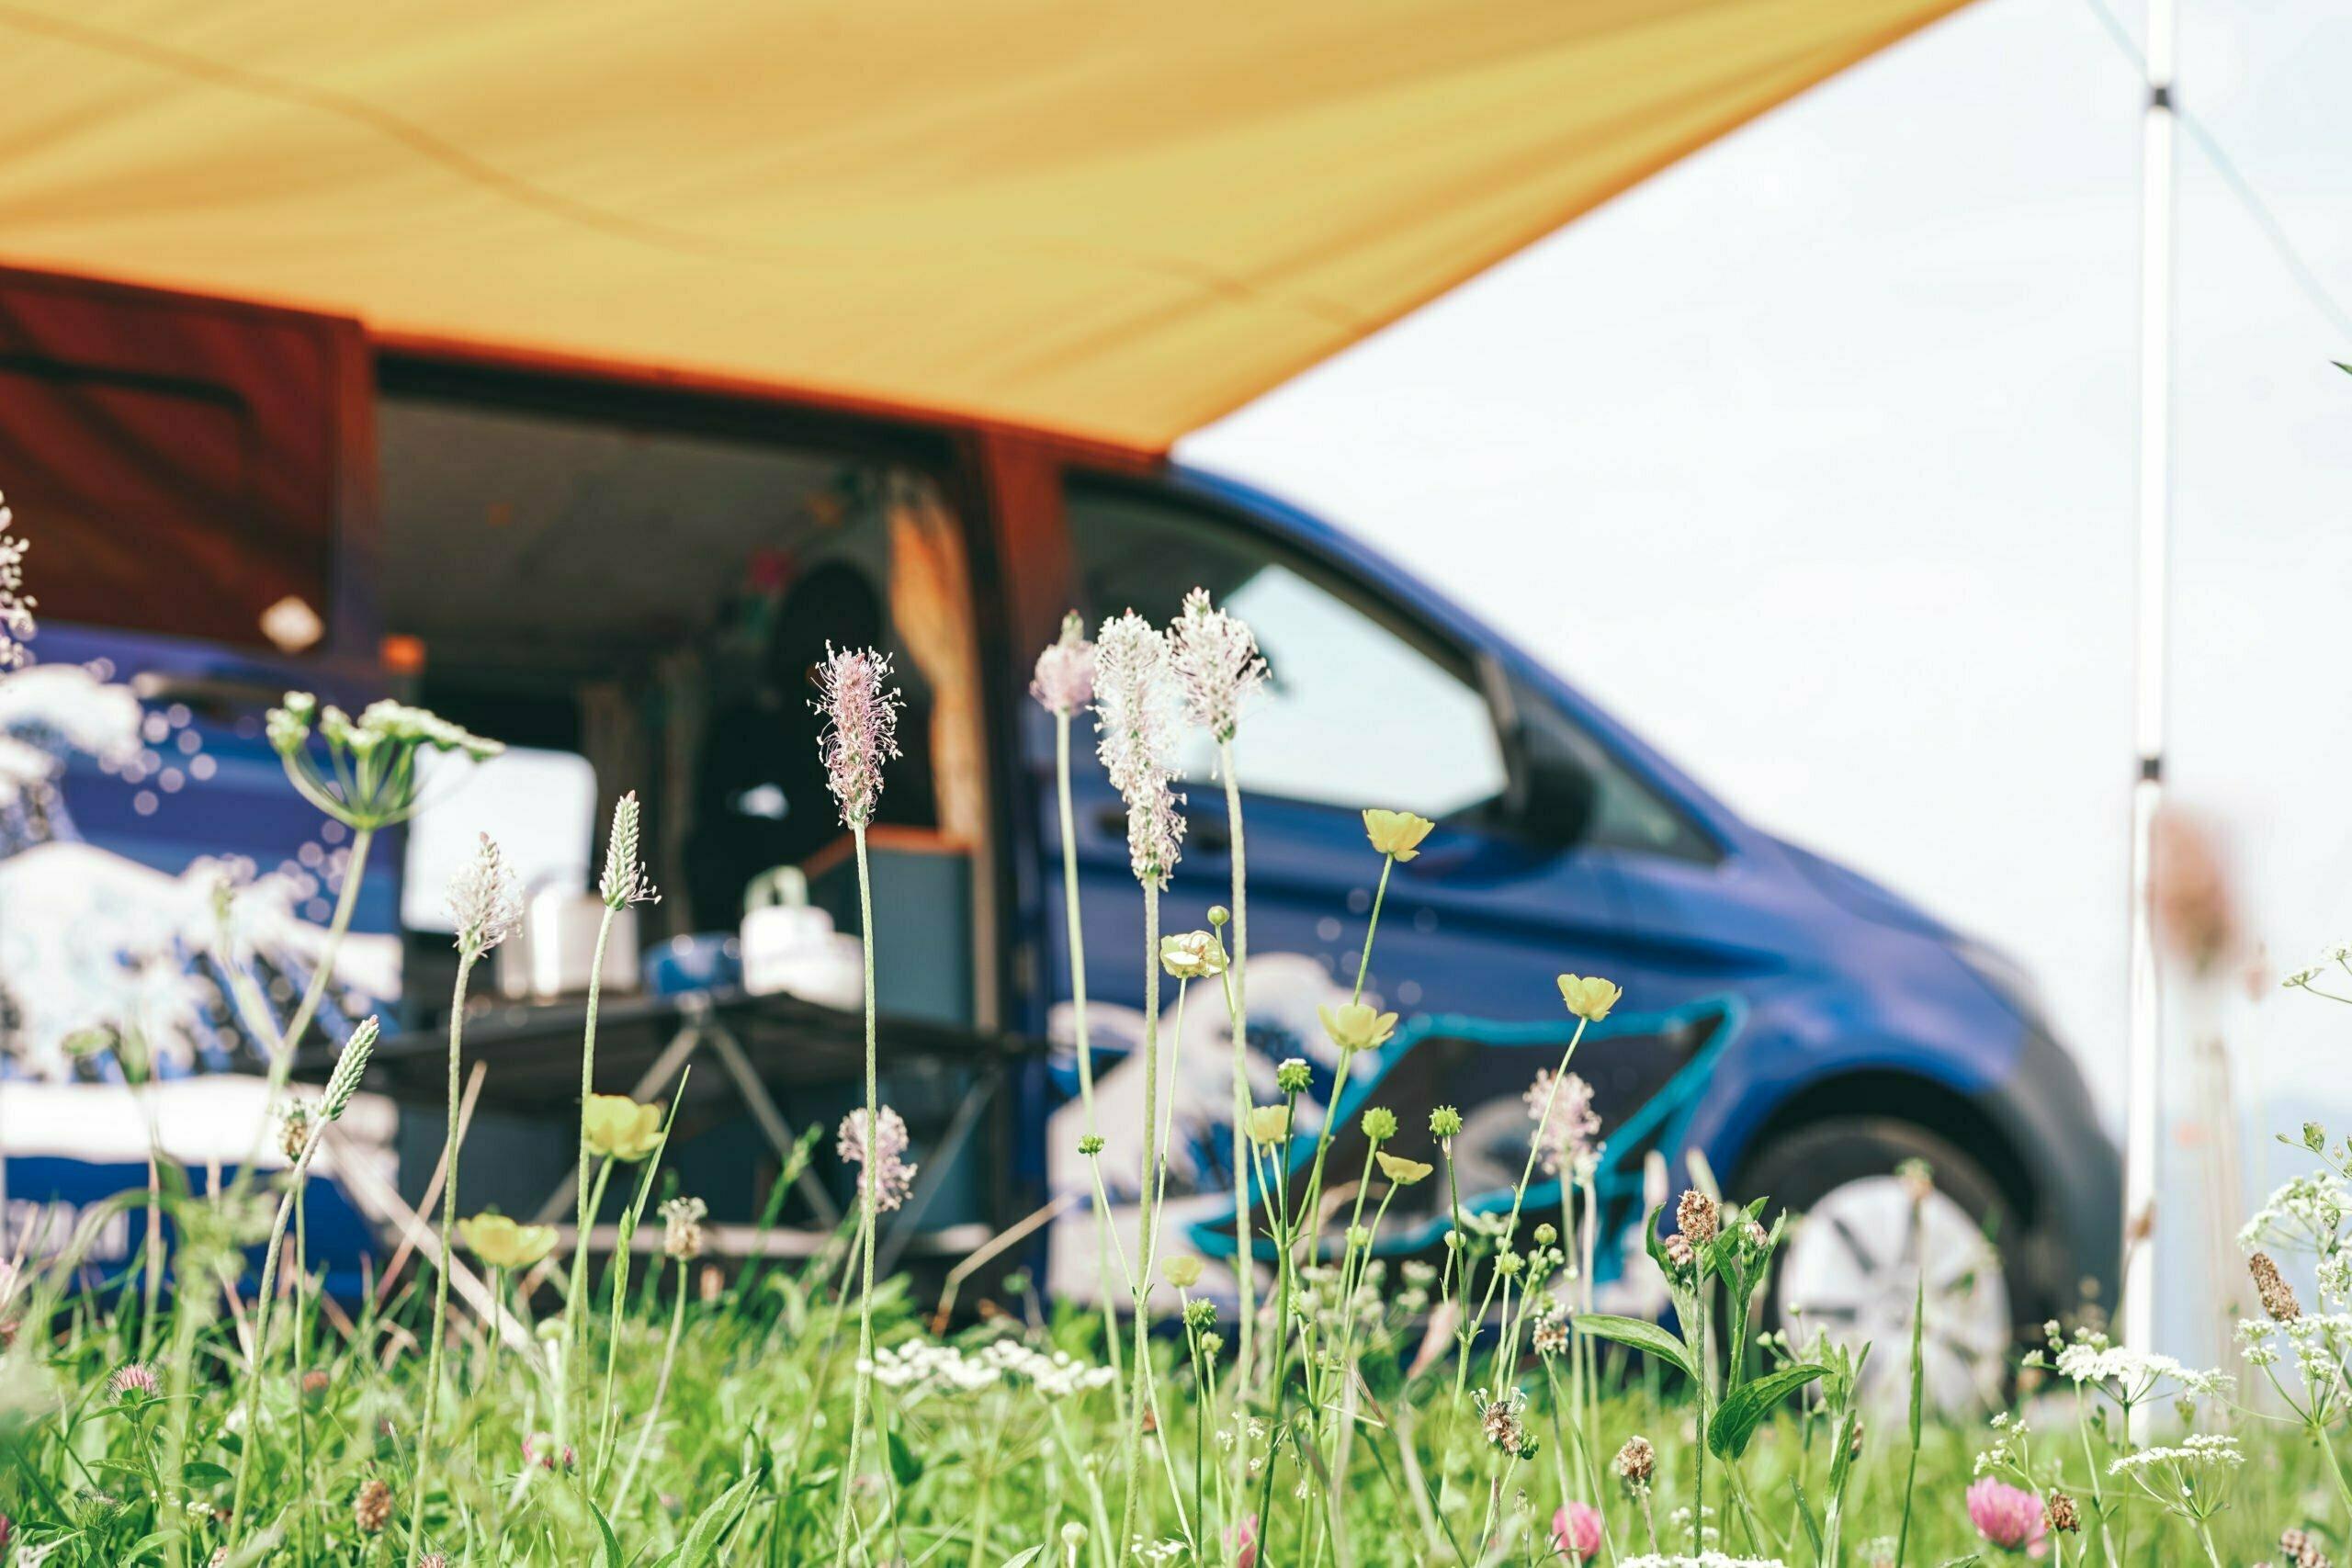 Camper Sonnensegel